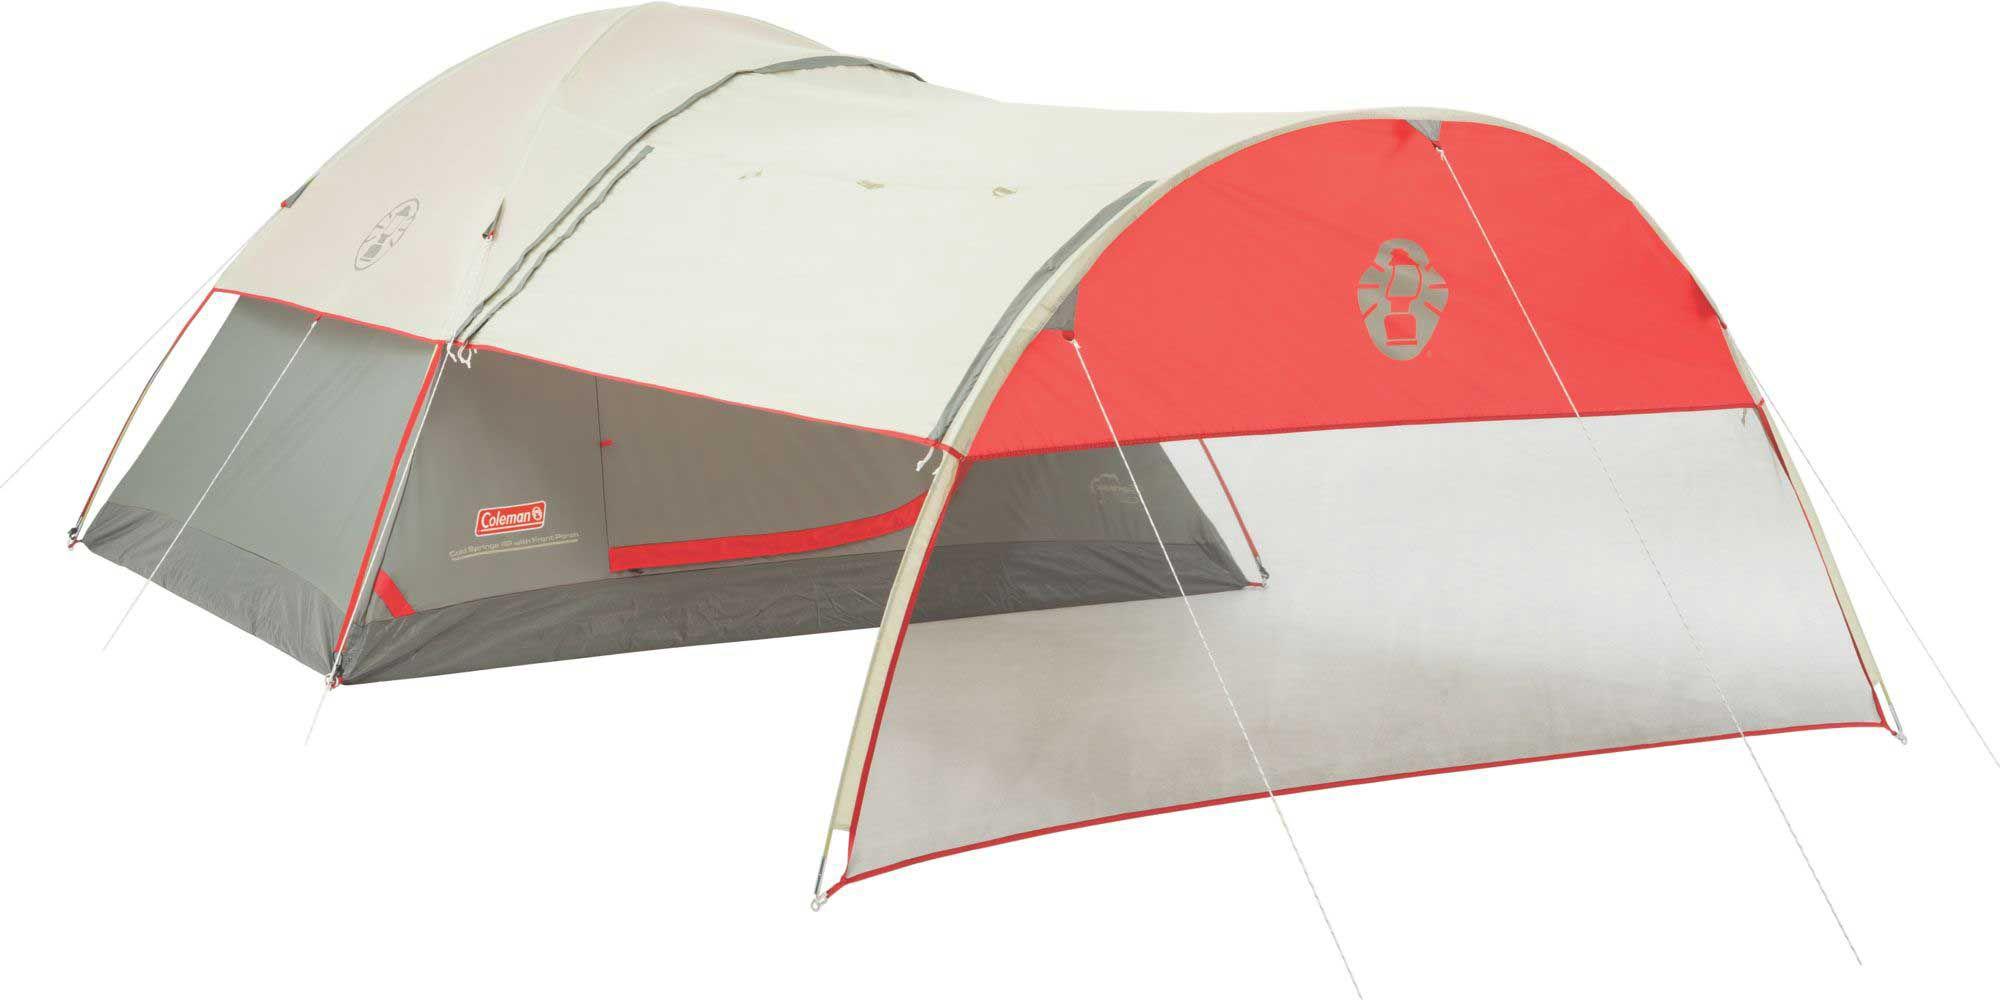 Coleman Sundome 4 Person Tent with Porch  sc 1 st  DICKu0027S Sporting Goods & Coleman Sundome 4 Person Tent with Porch | DICKu0027S Sporting Goods